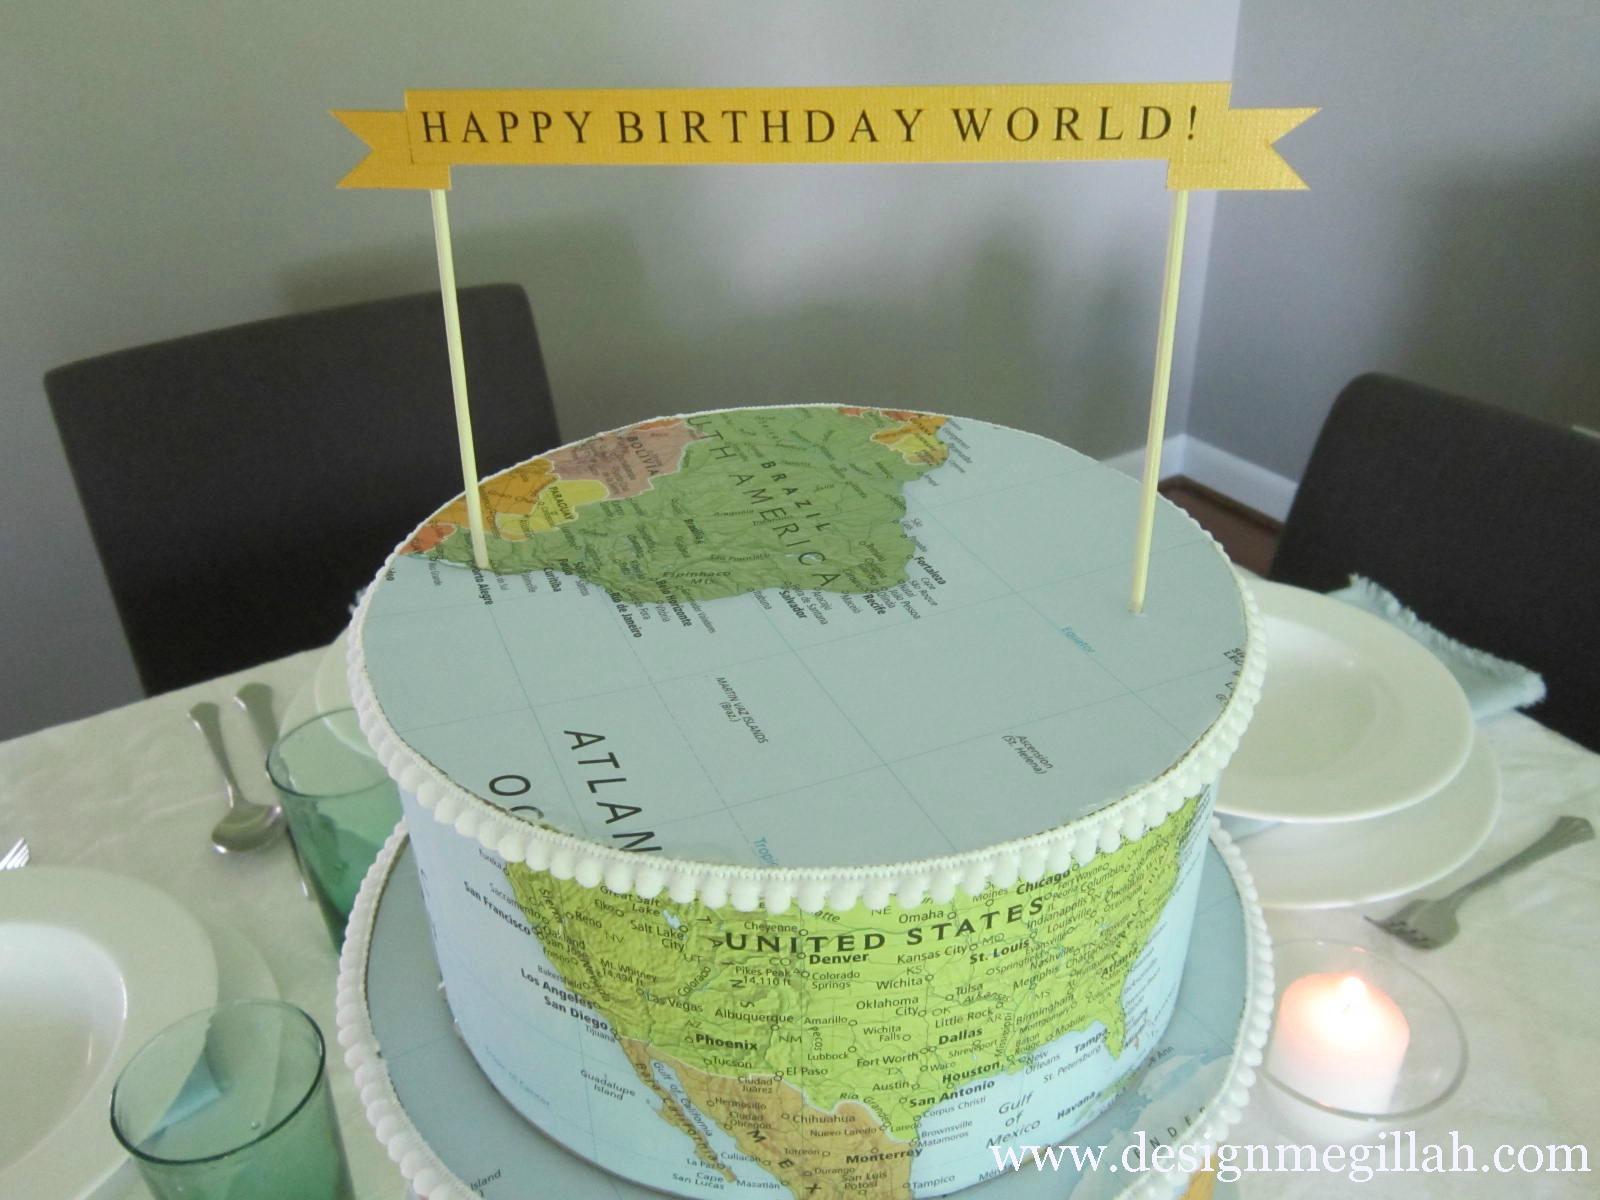 Design megillah rosh hashanah cake centerpiece rosh hashanah cake centerpiece gumiabroncs Images